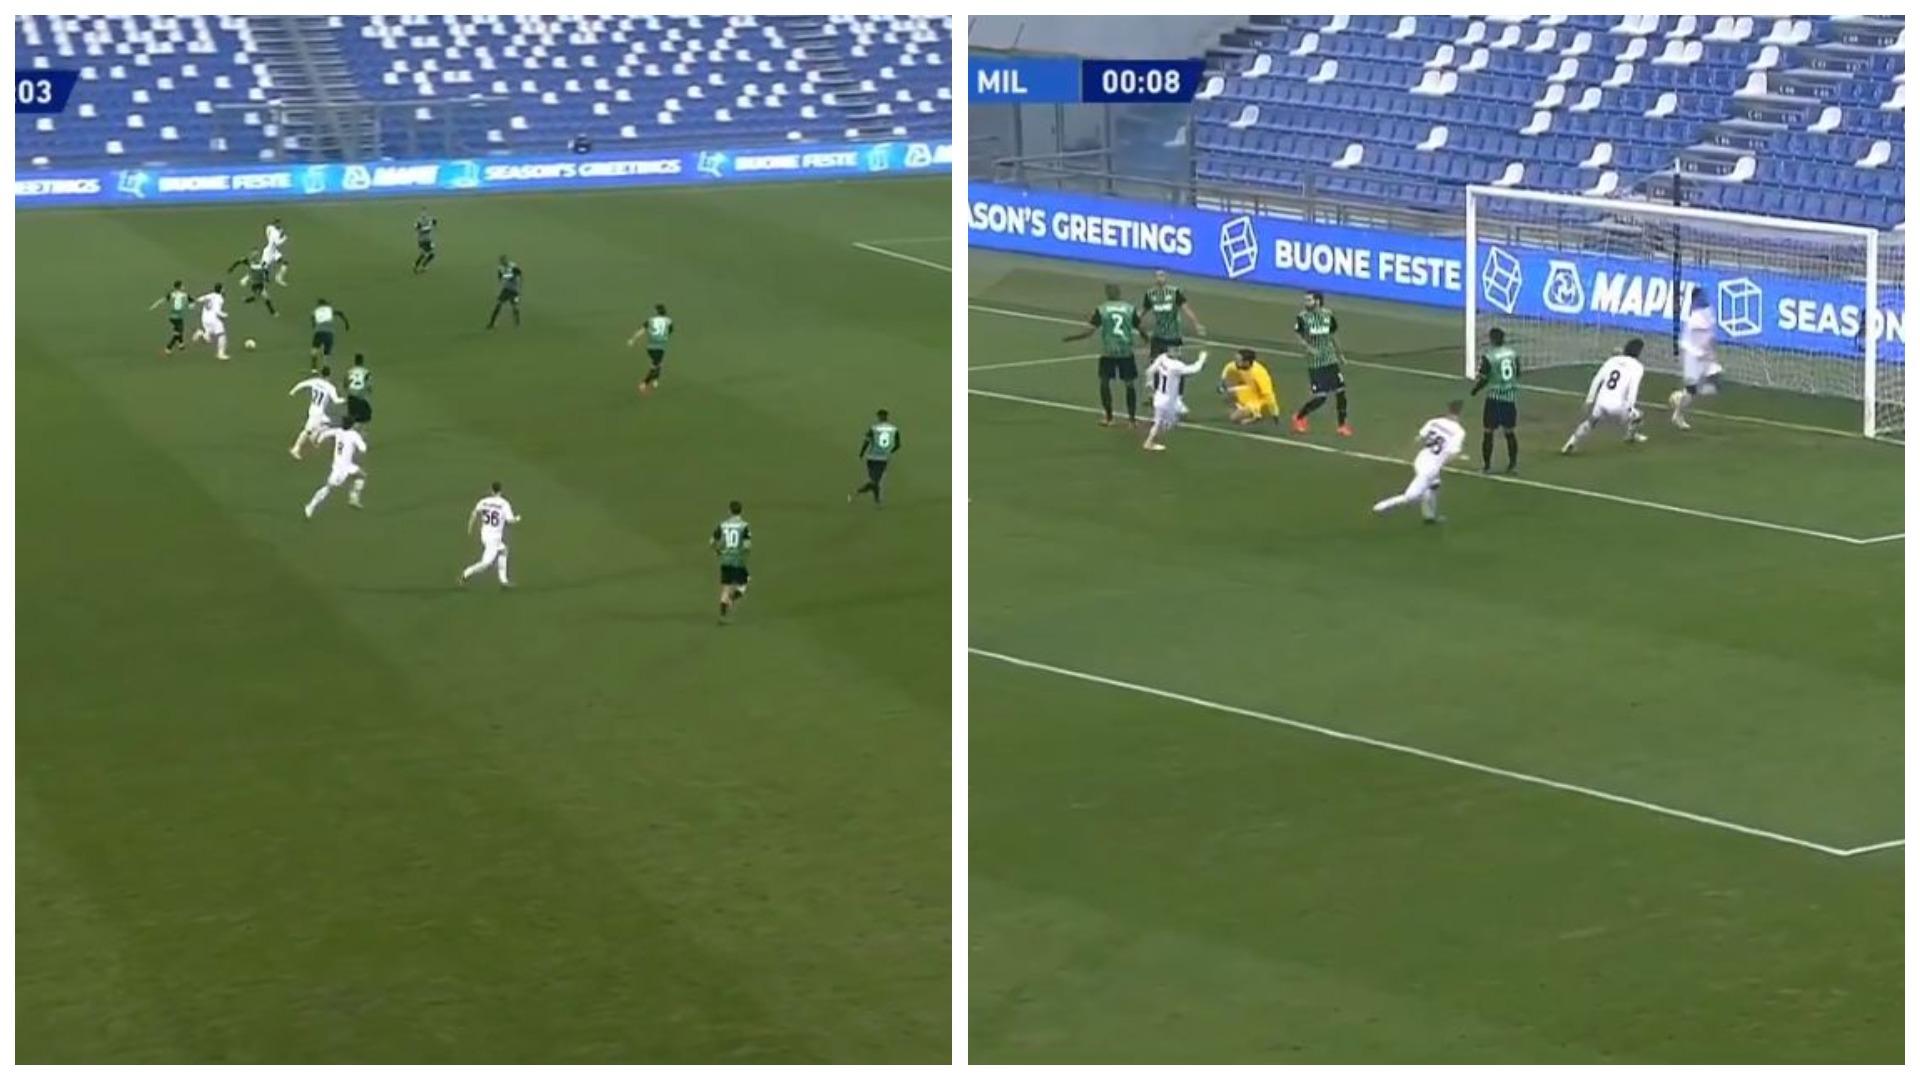 VIDEO/ Gol historik në Itali, Leao i Milanit thyen rekordin 19-vjeçar